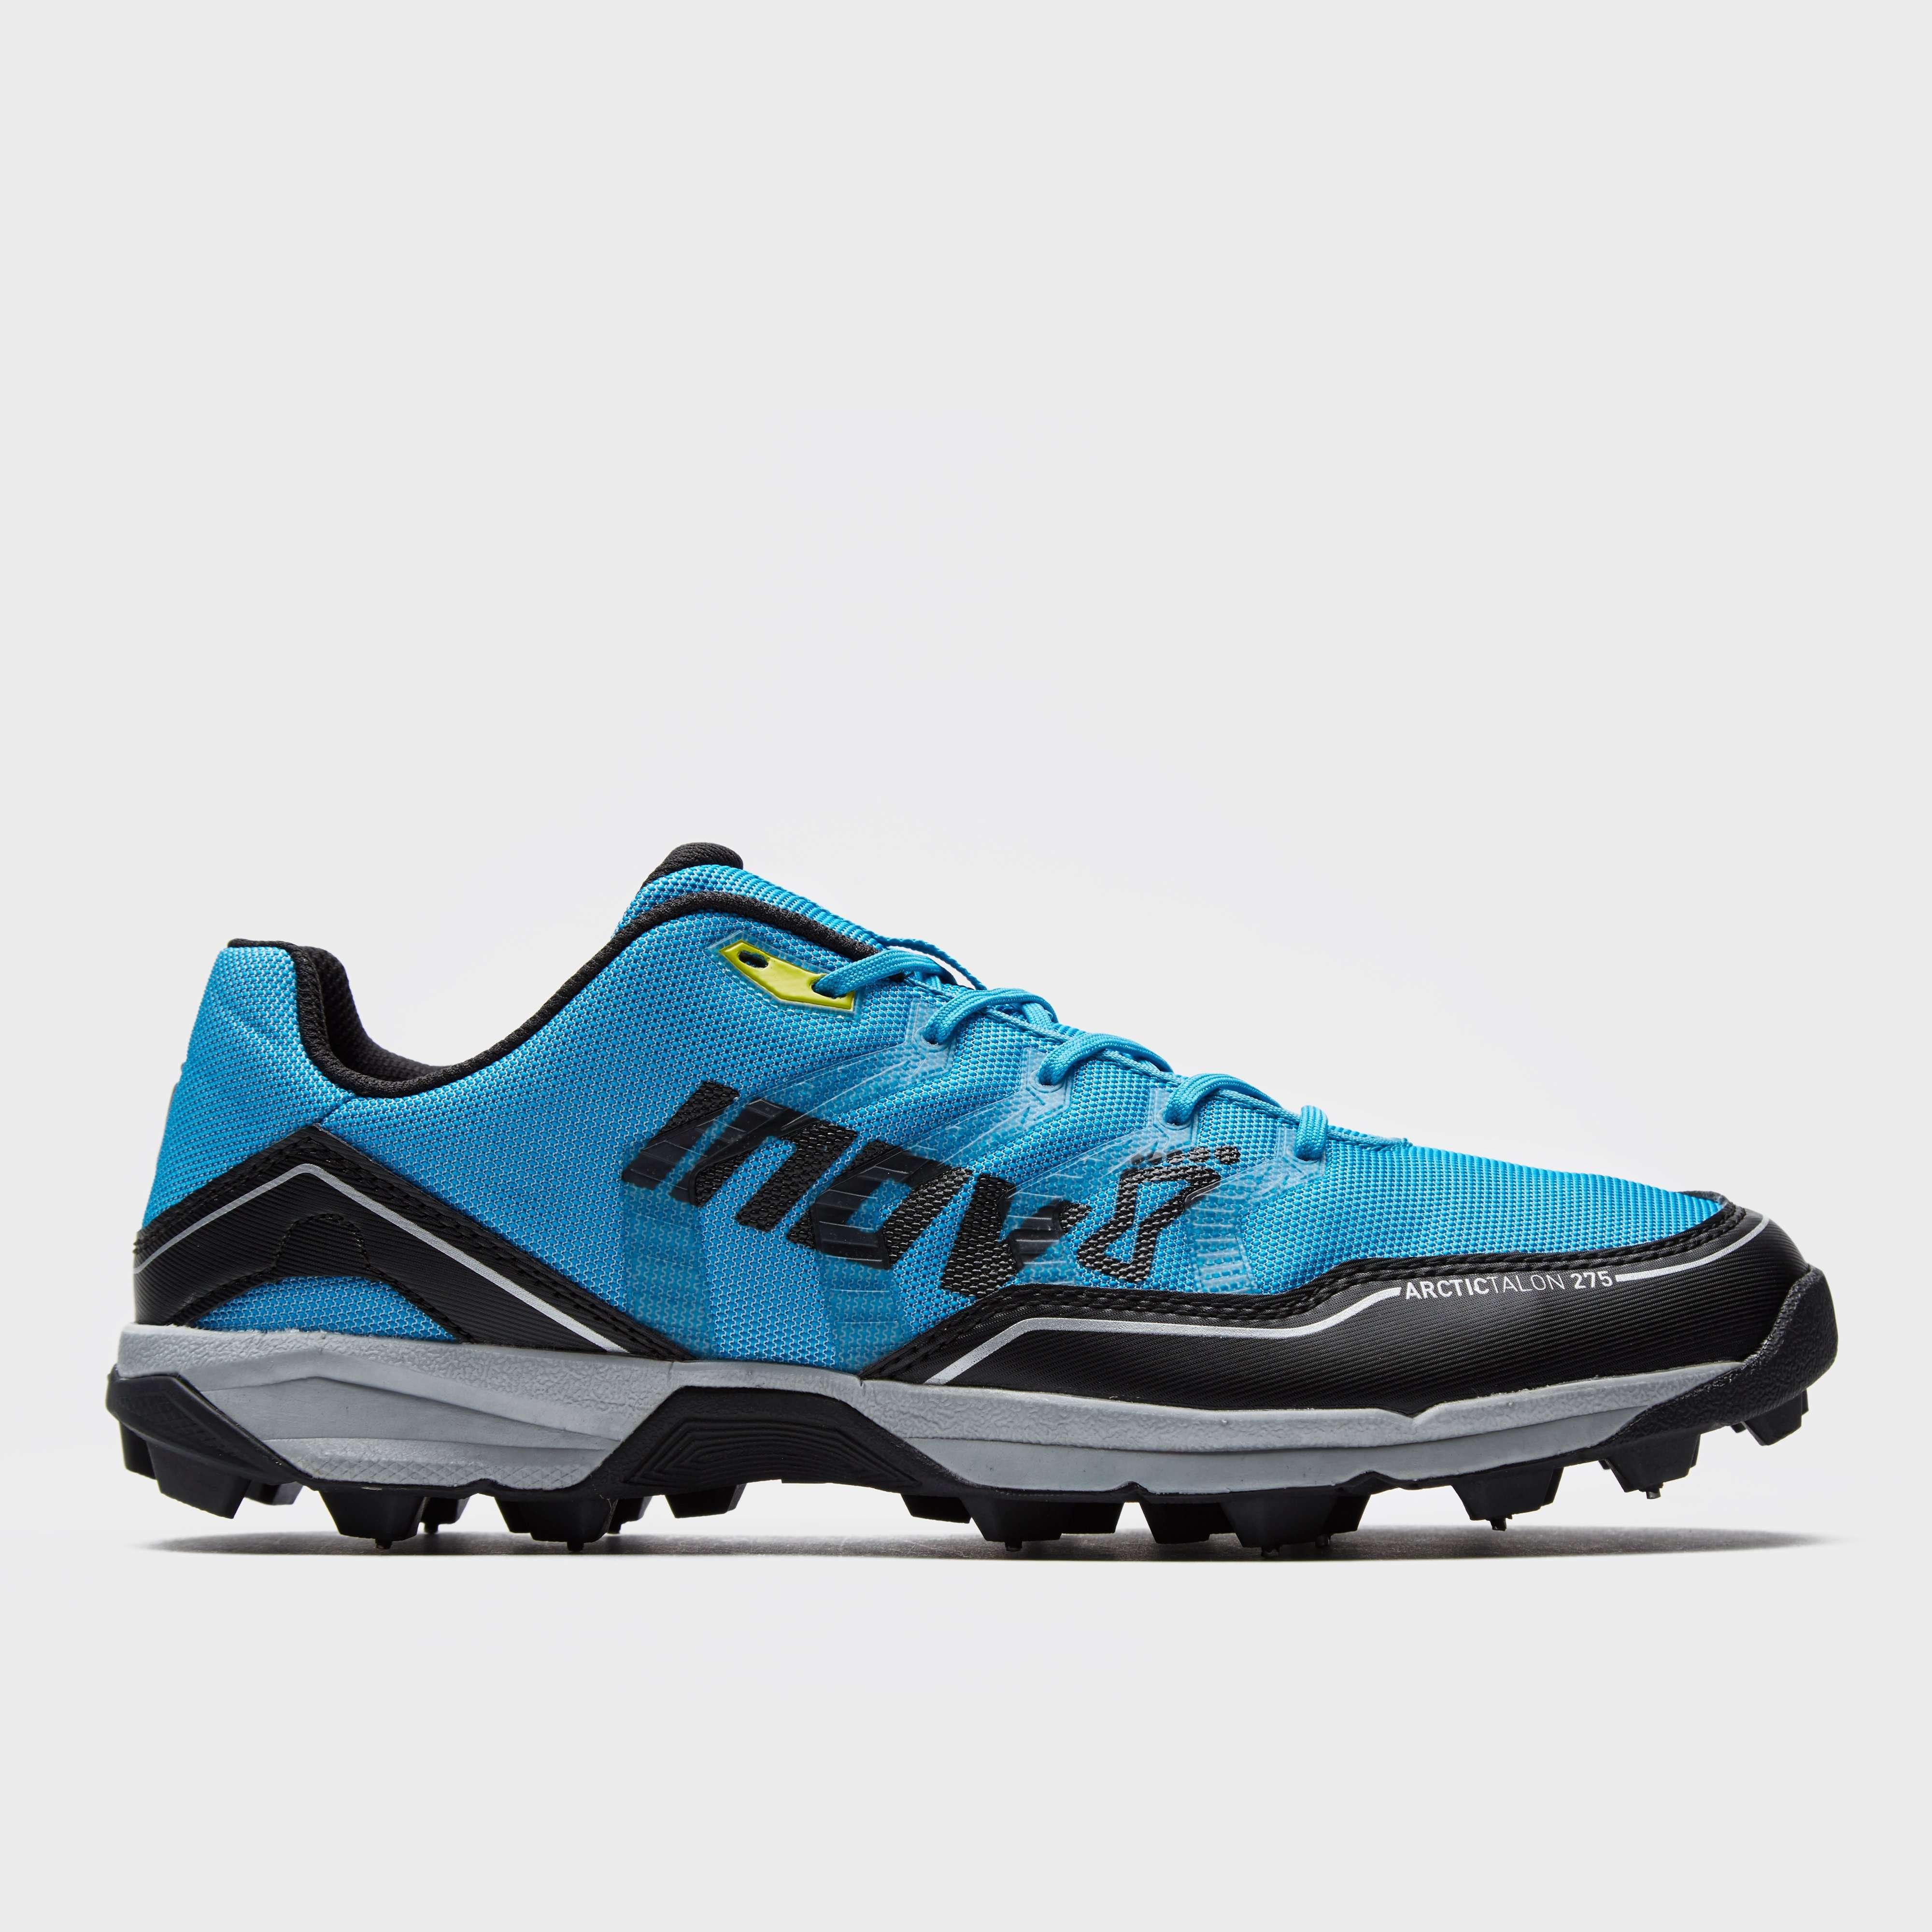 INOV-8 Men's Arctic Talon 275 Trail Running Shoe